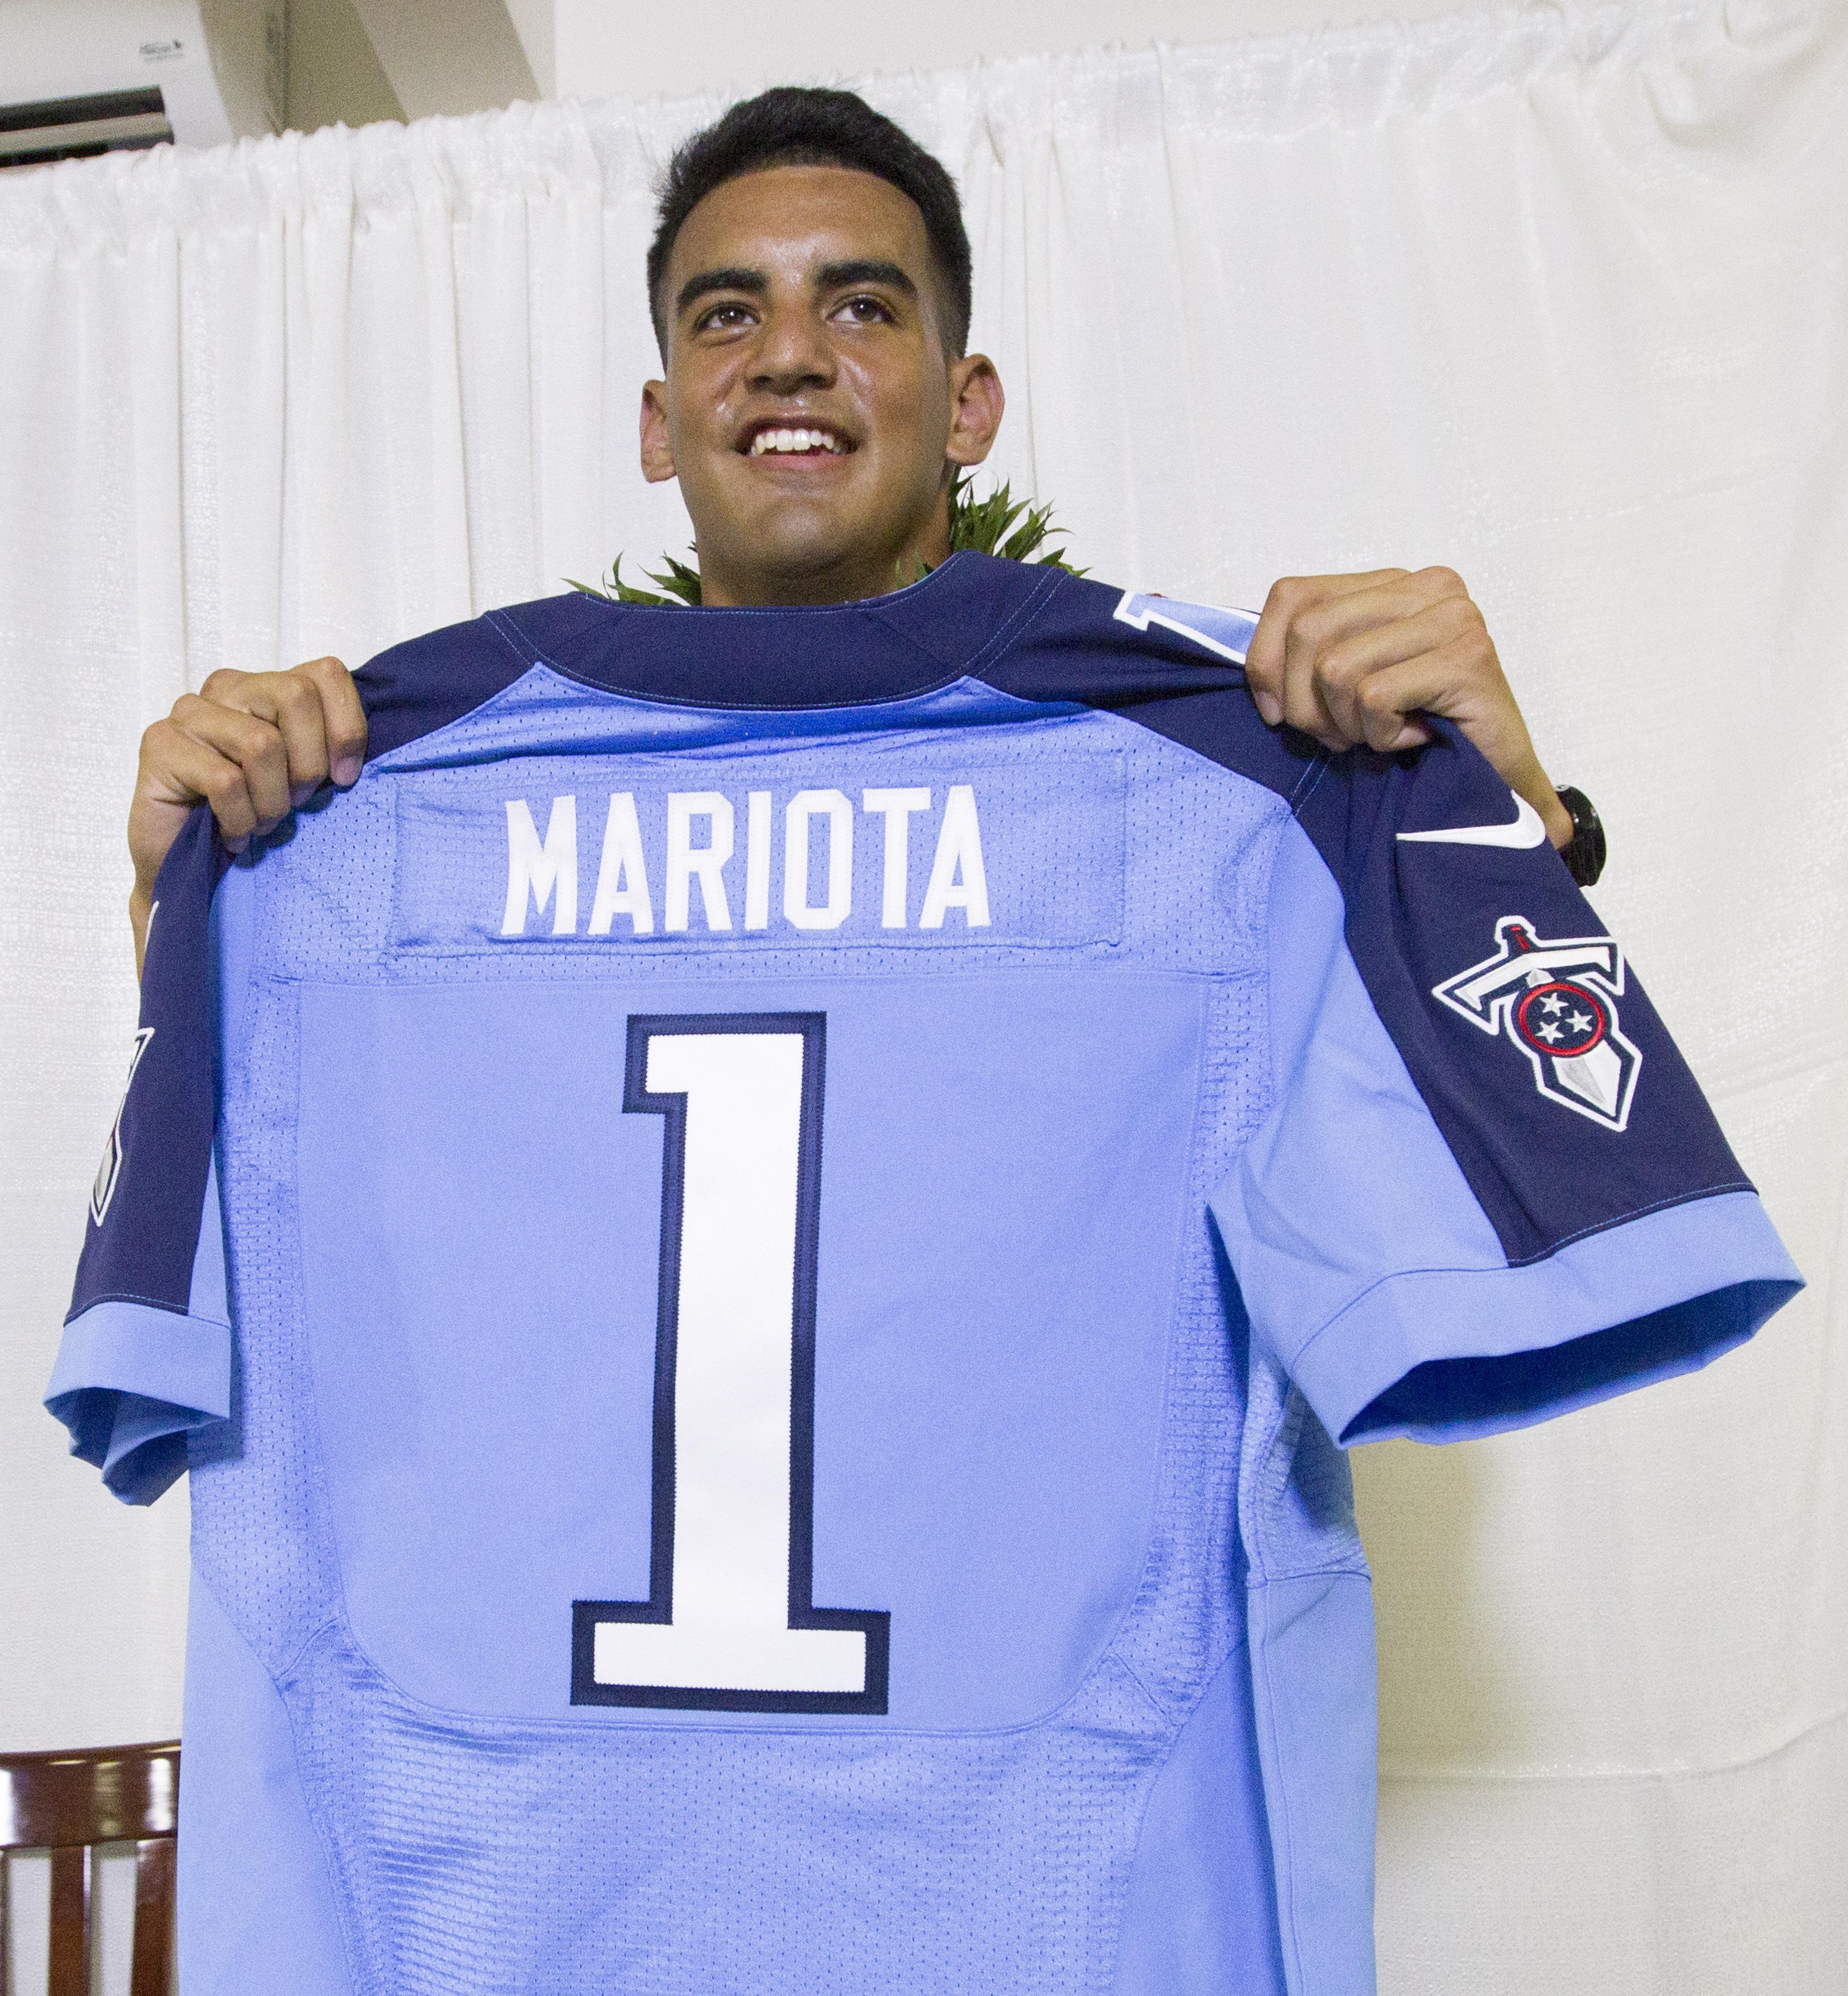 c7833bde1 The NFL Draft  Marcus Mariota s Titanic Potential – Rolling Stone